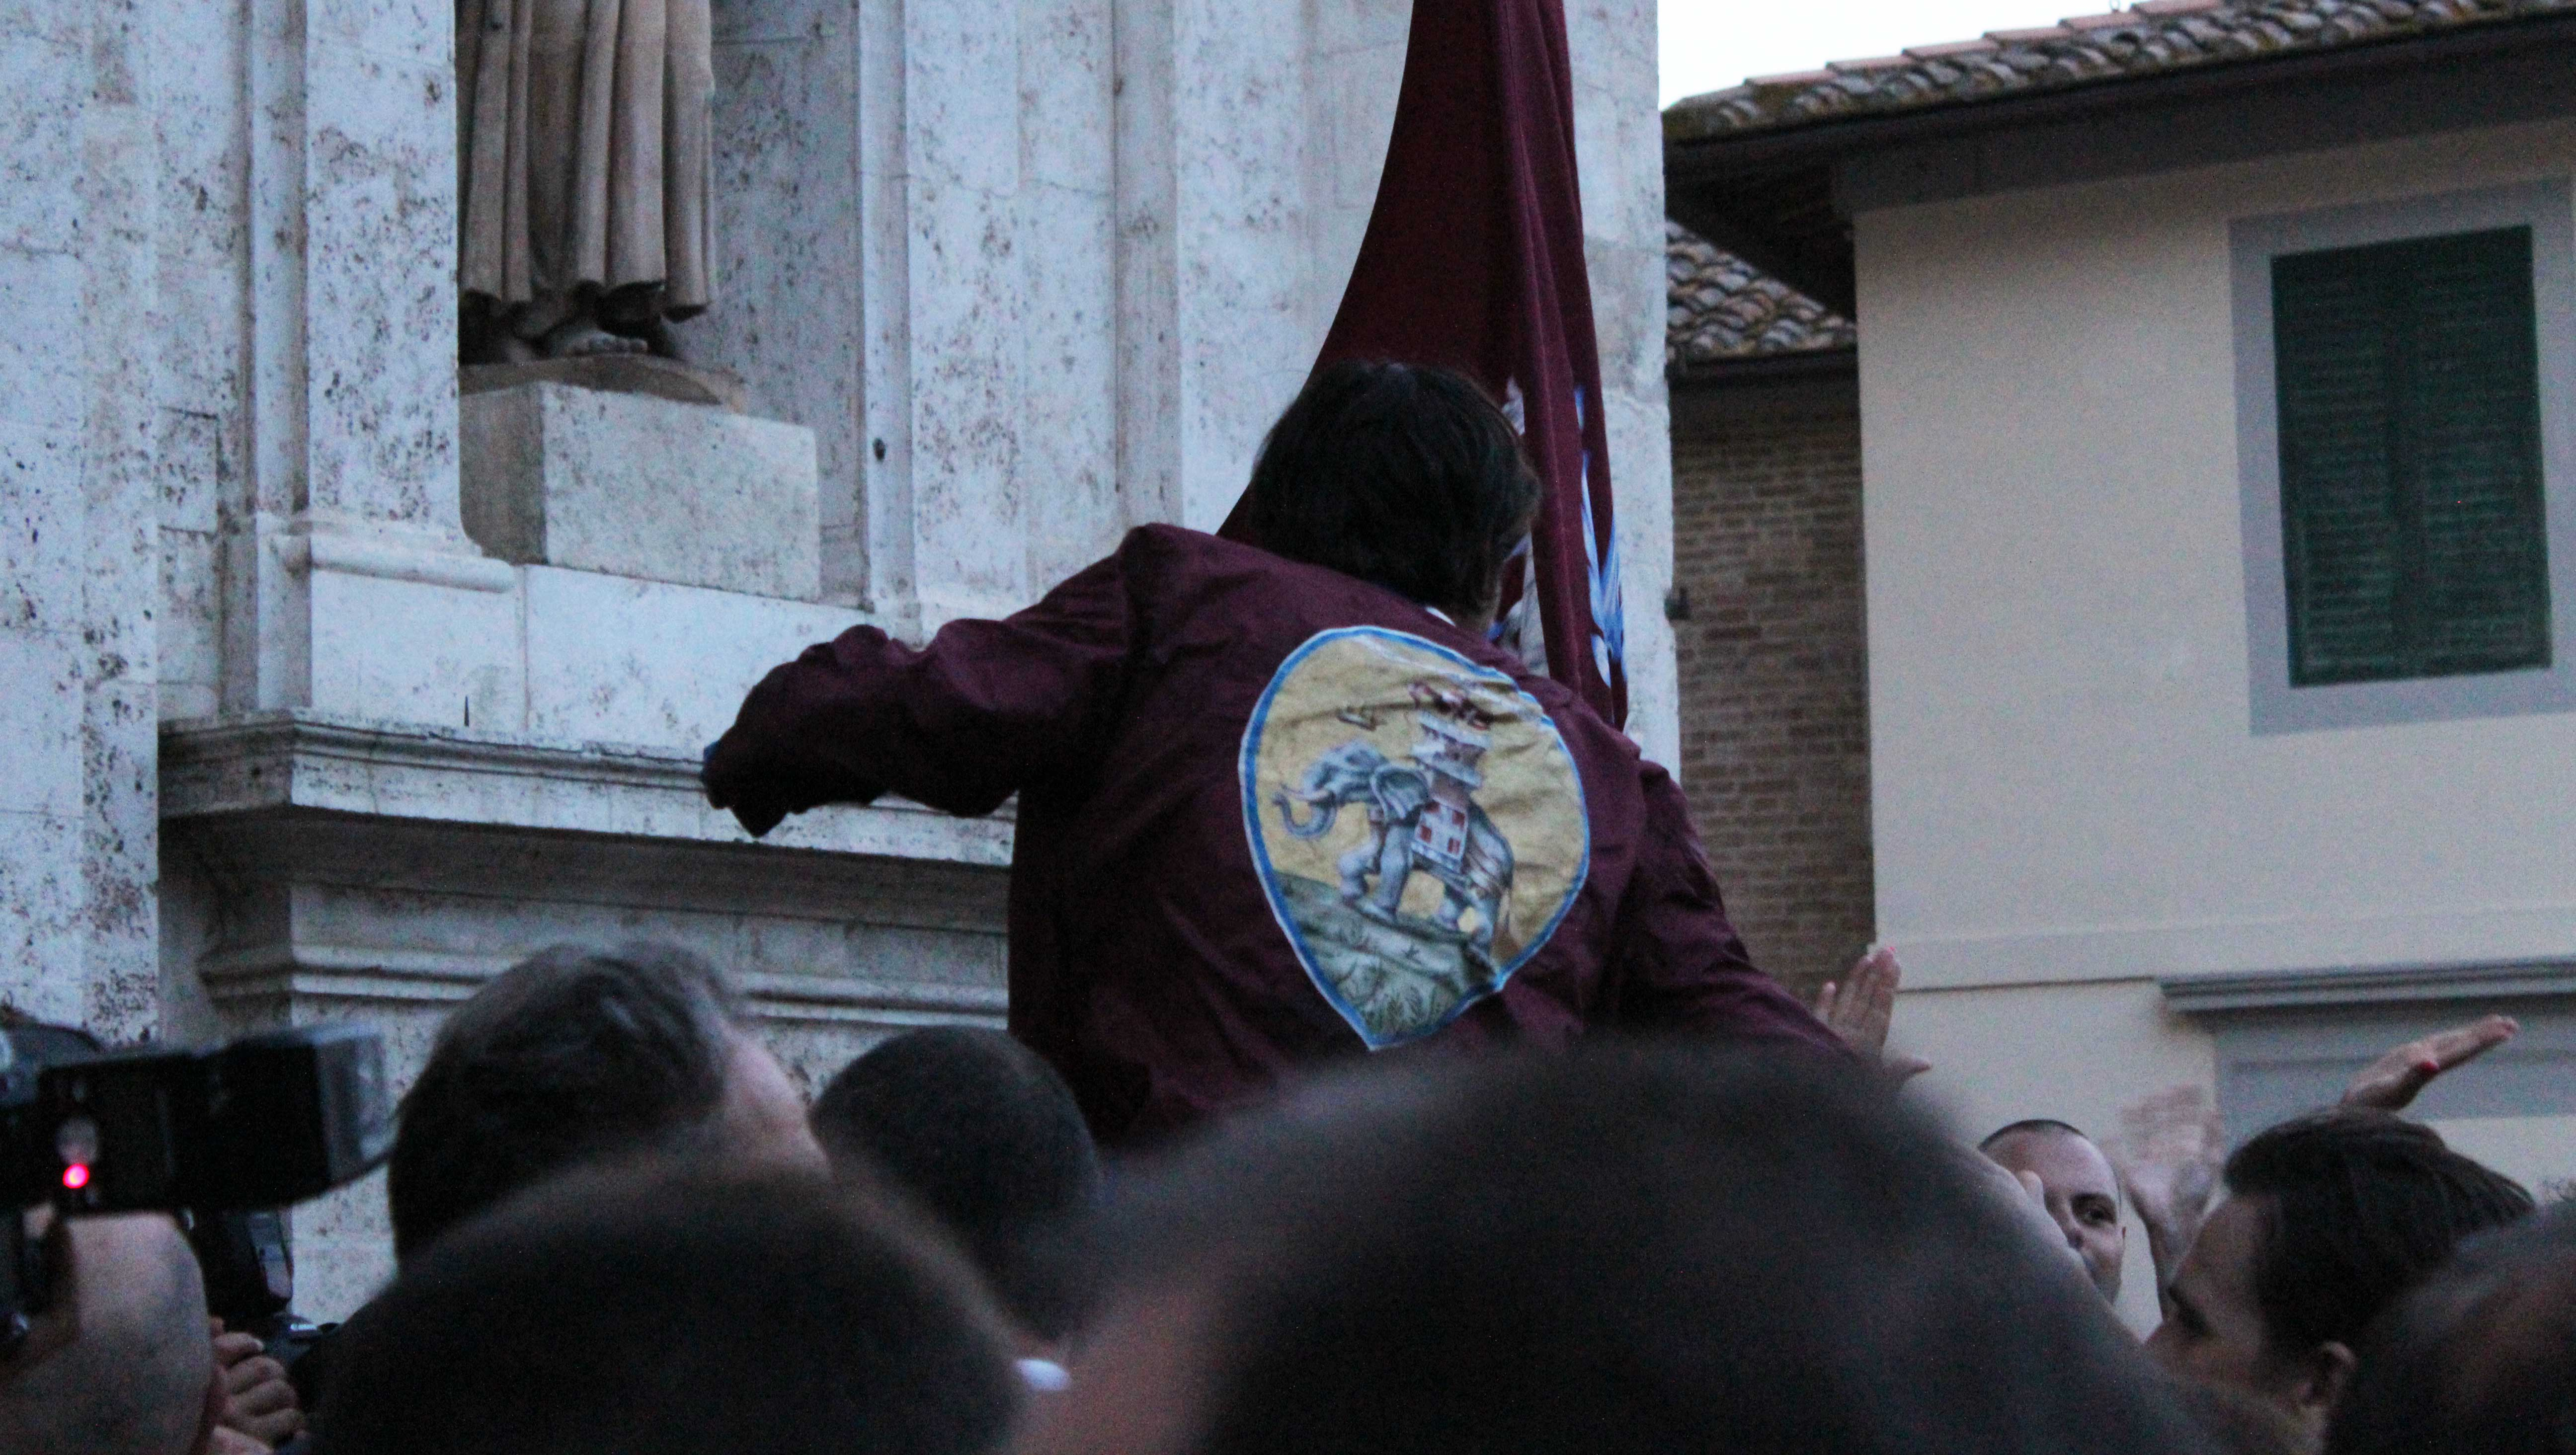 AndreaMari